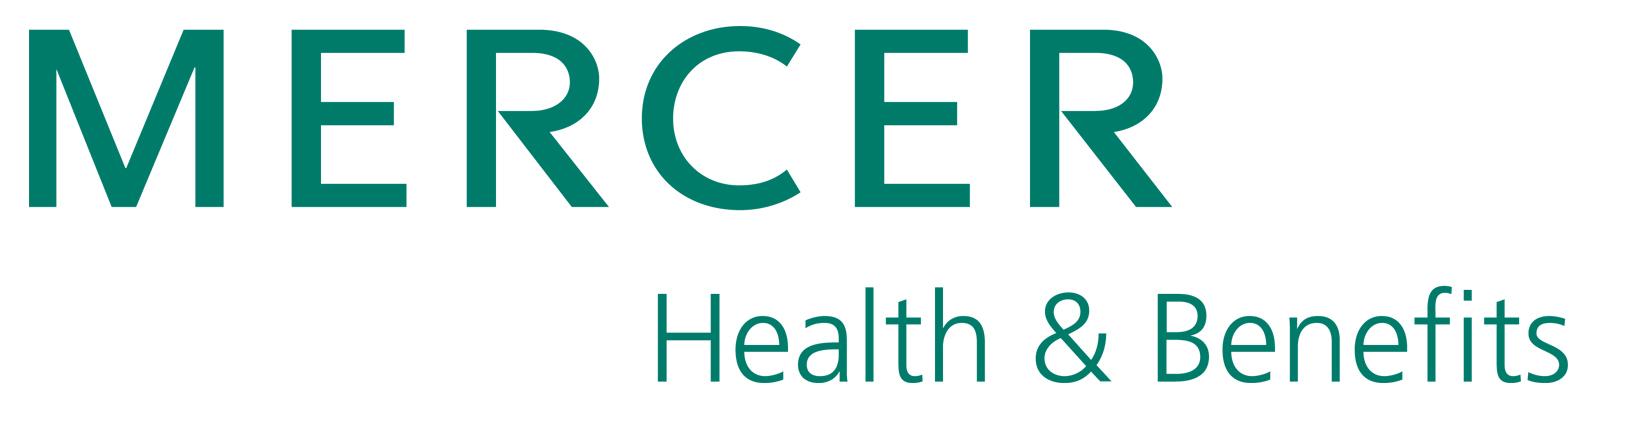 Mercer Health and Benefits